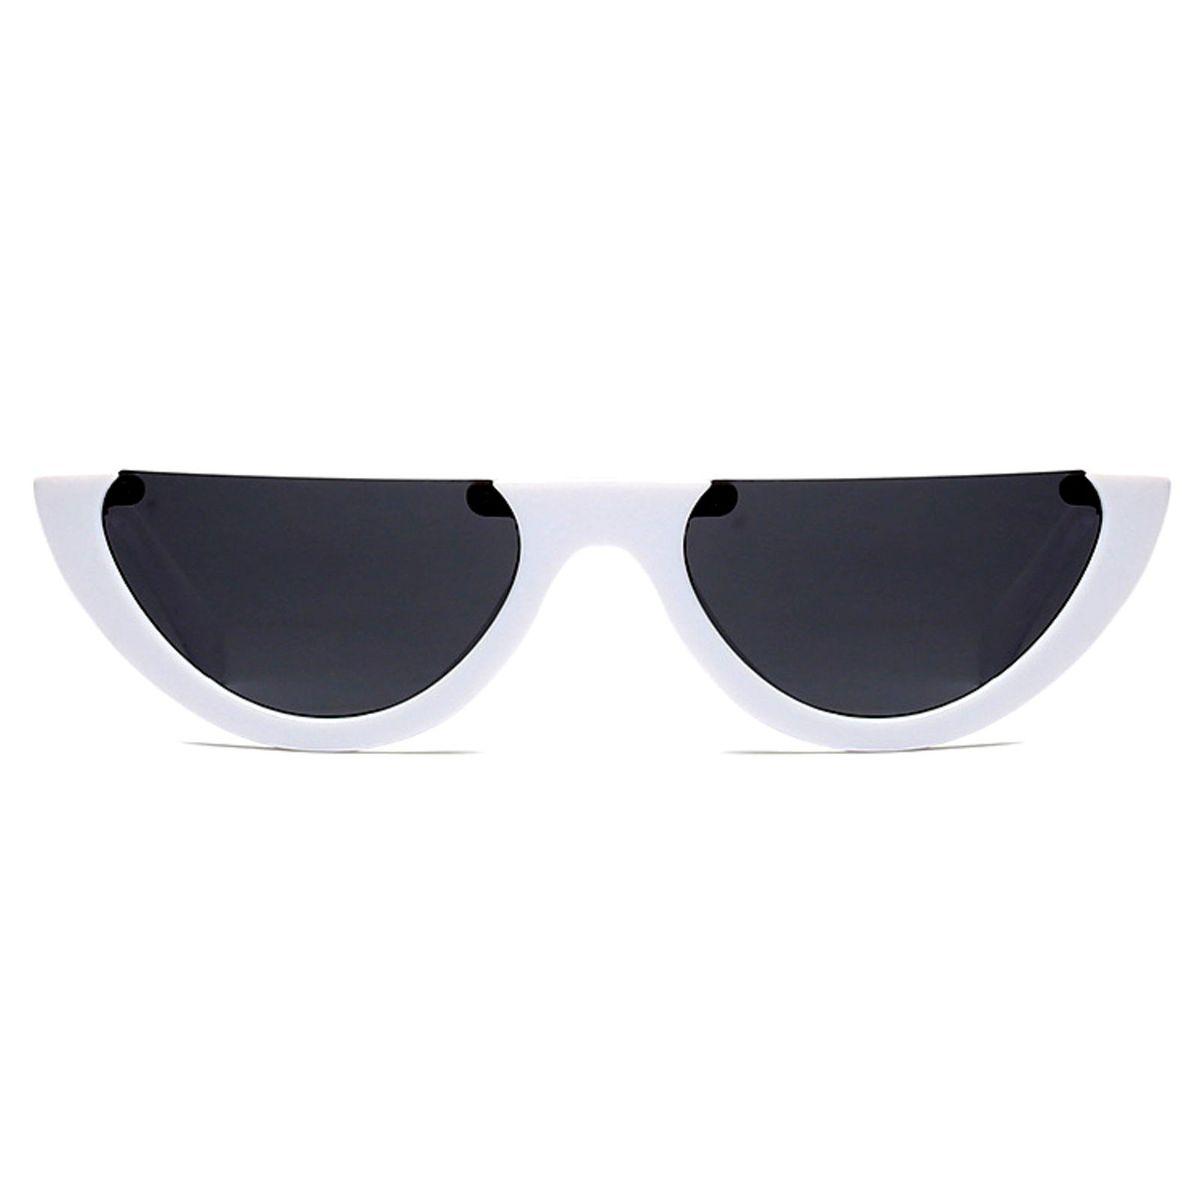 e3c10f5c2 Óculos Retro Metade Branco   Óculos Feminino Genie Vintage Usado 30910712    enjoei